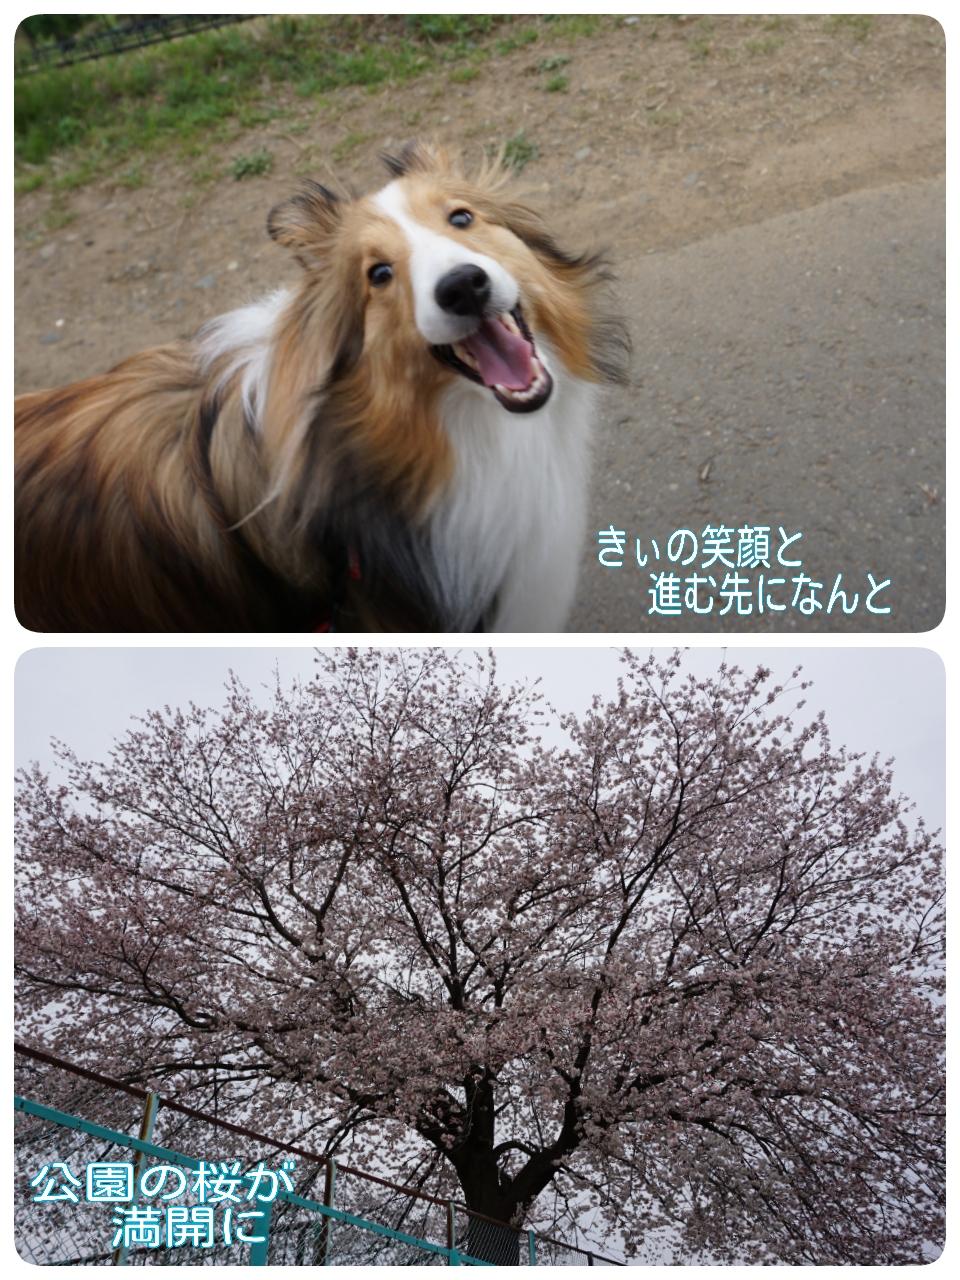 2015-04-01-14-28-36_deco.jpg